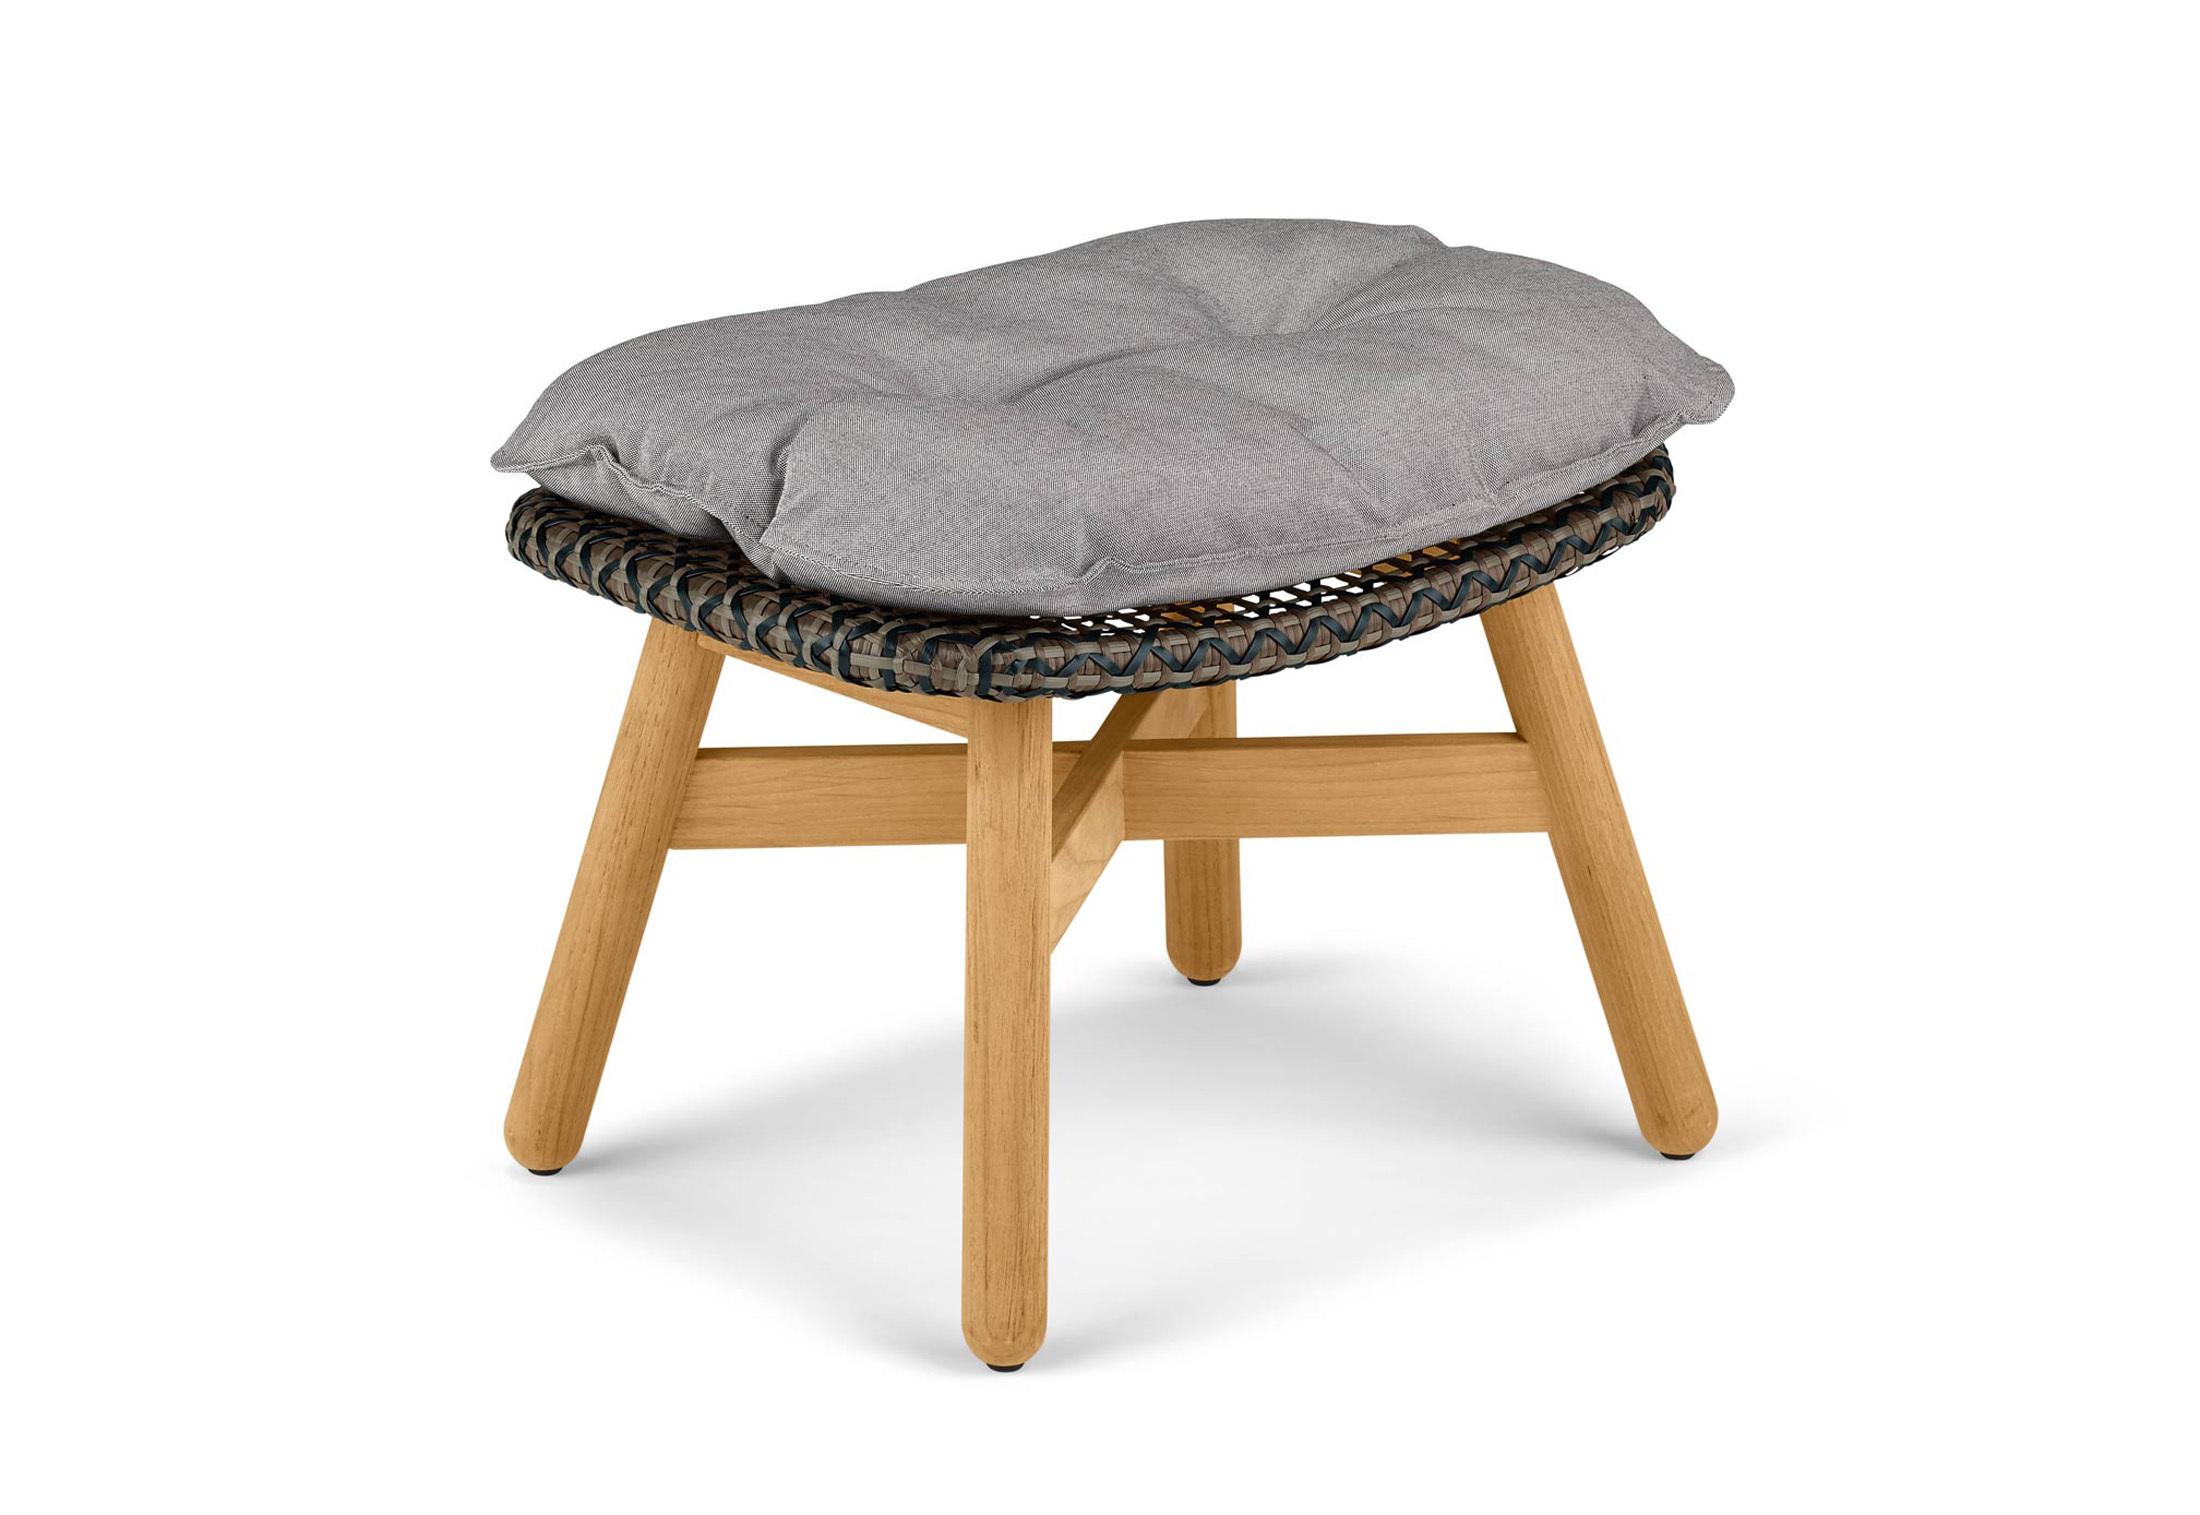 mbrace hocker von dedon stylepark. Black Bedroom Furniture Sets. Home Design Ideas